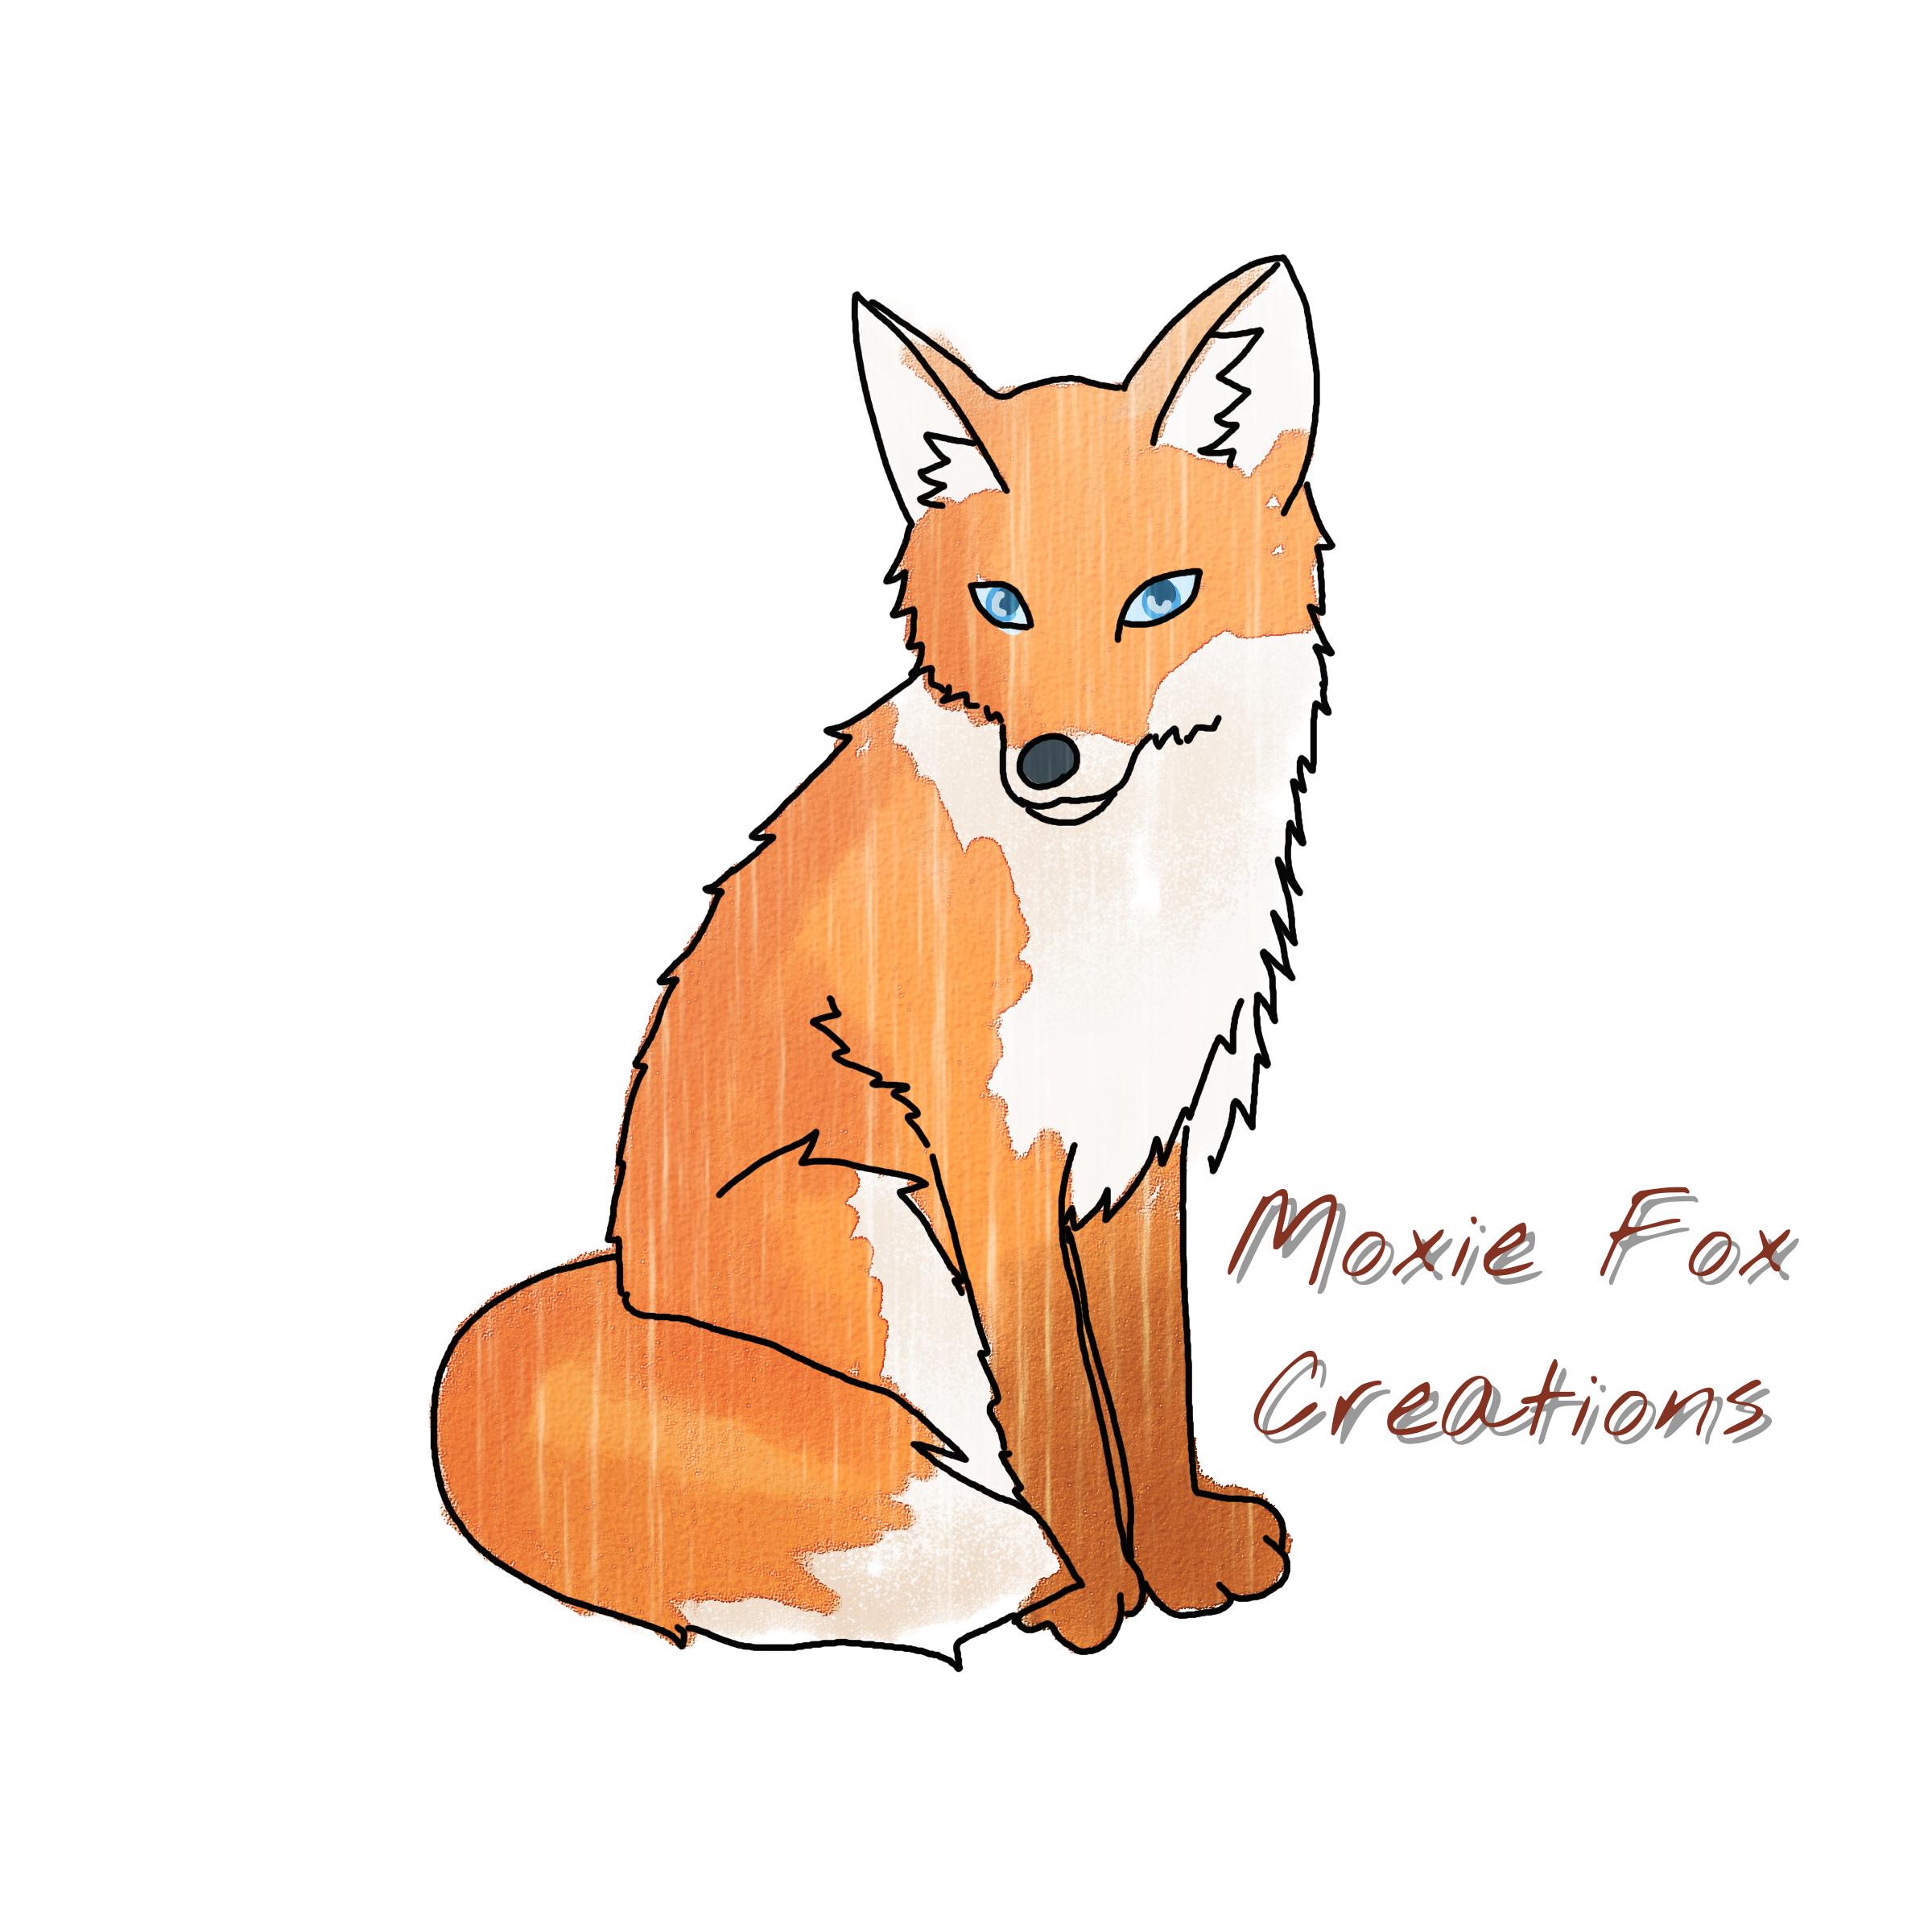 Moxie Fox Creations